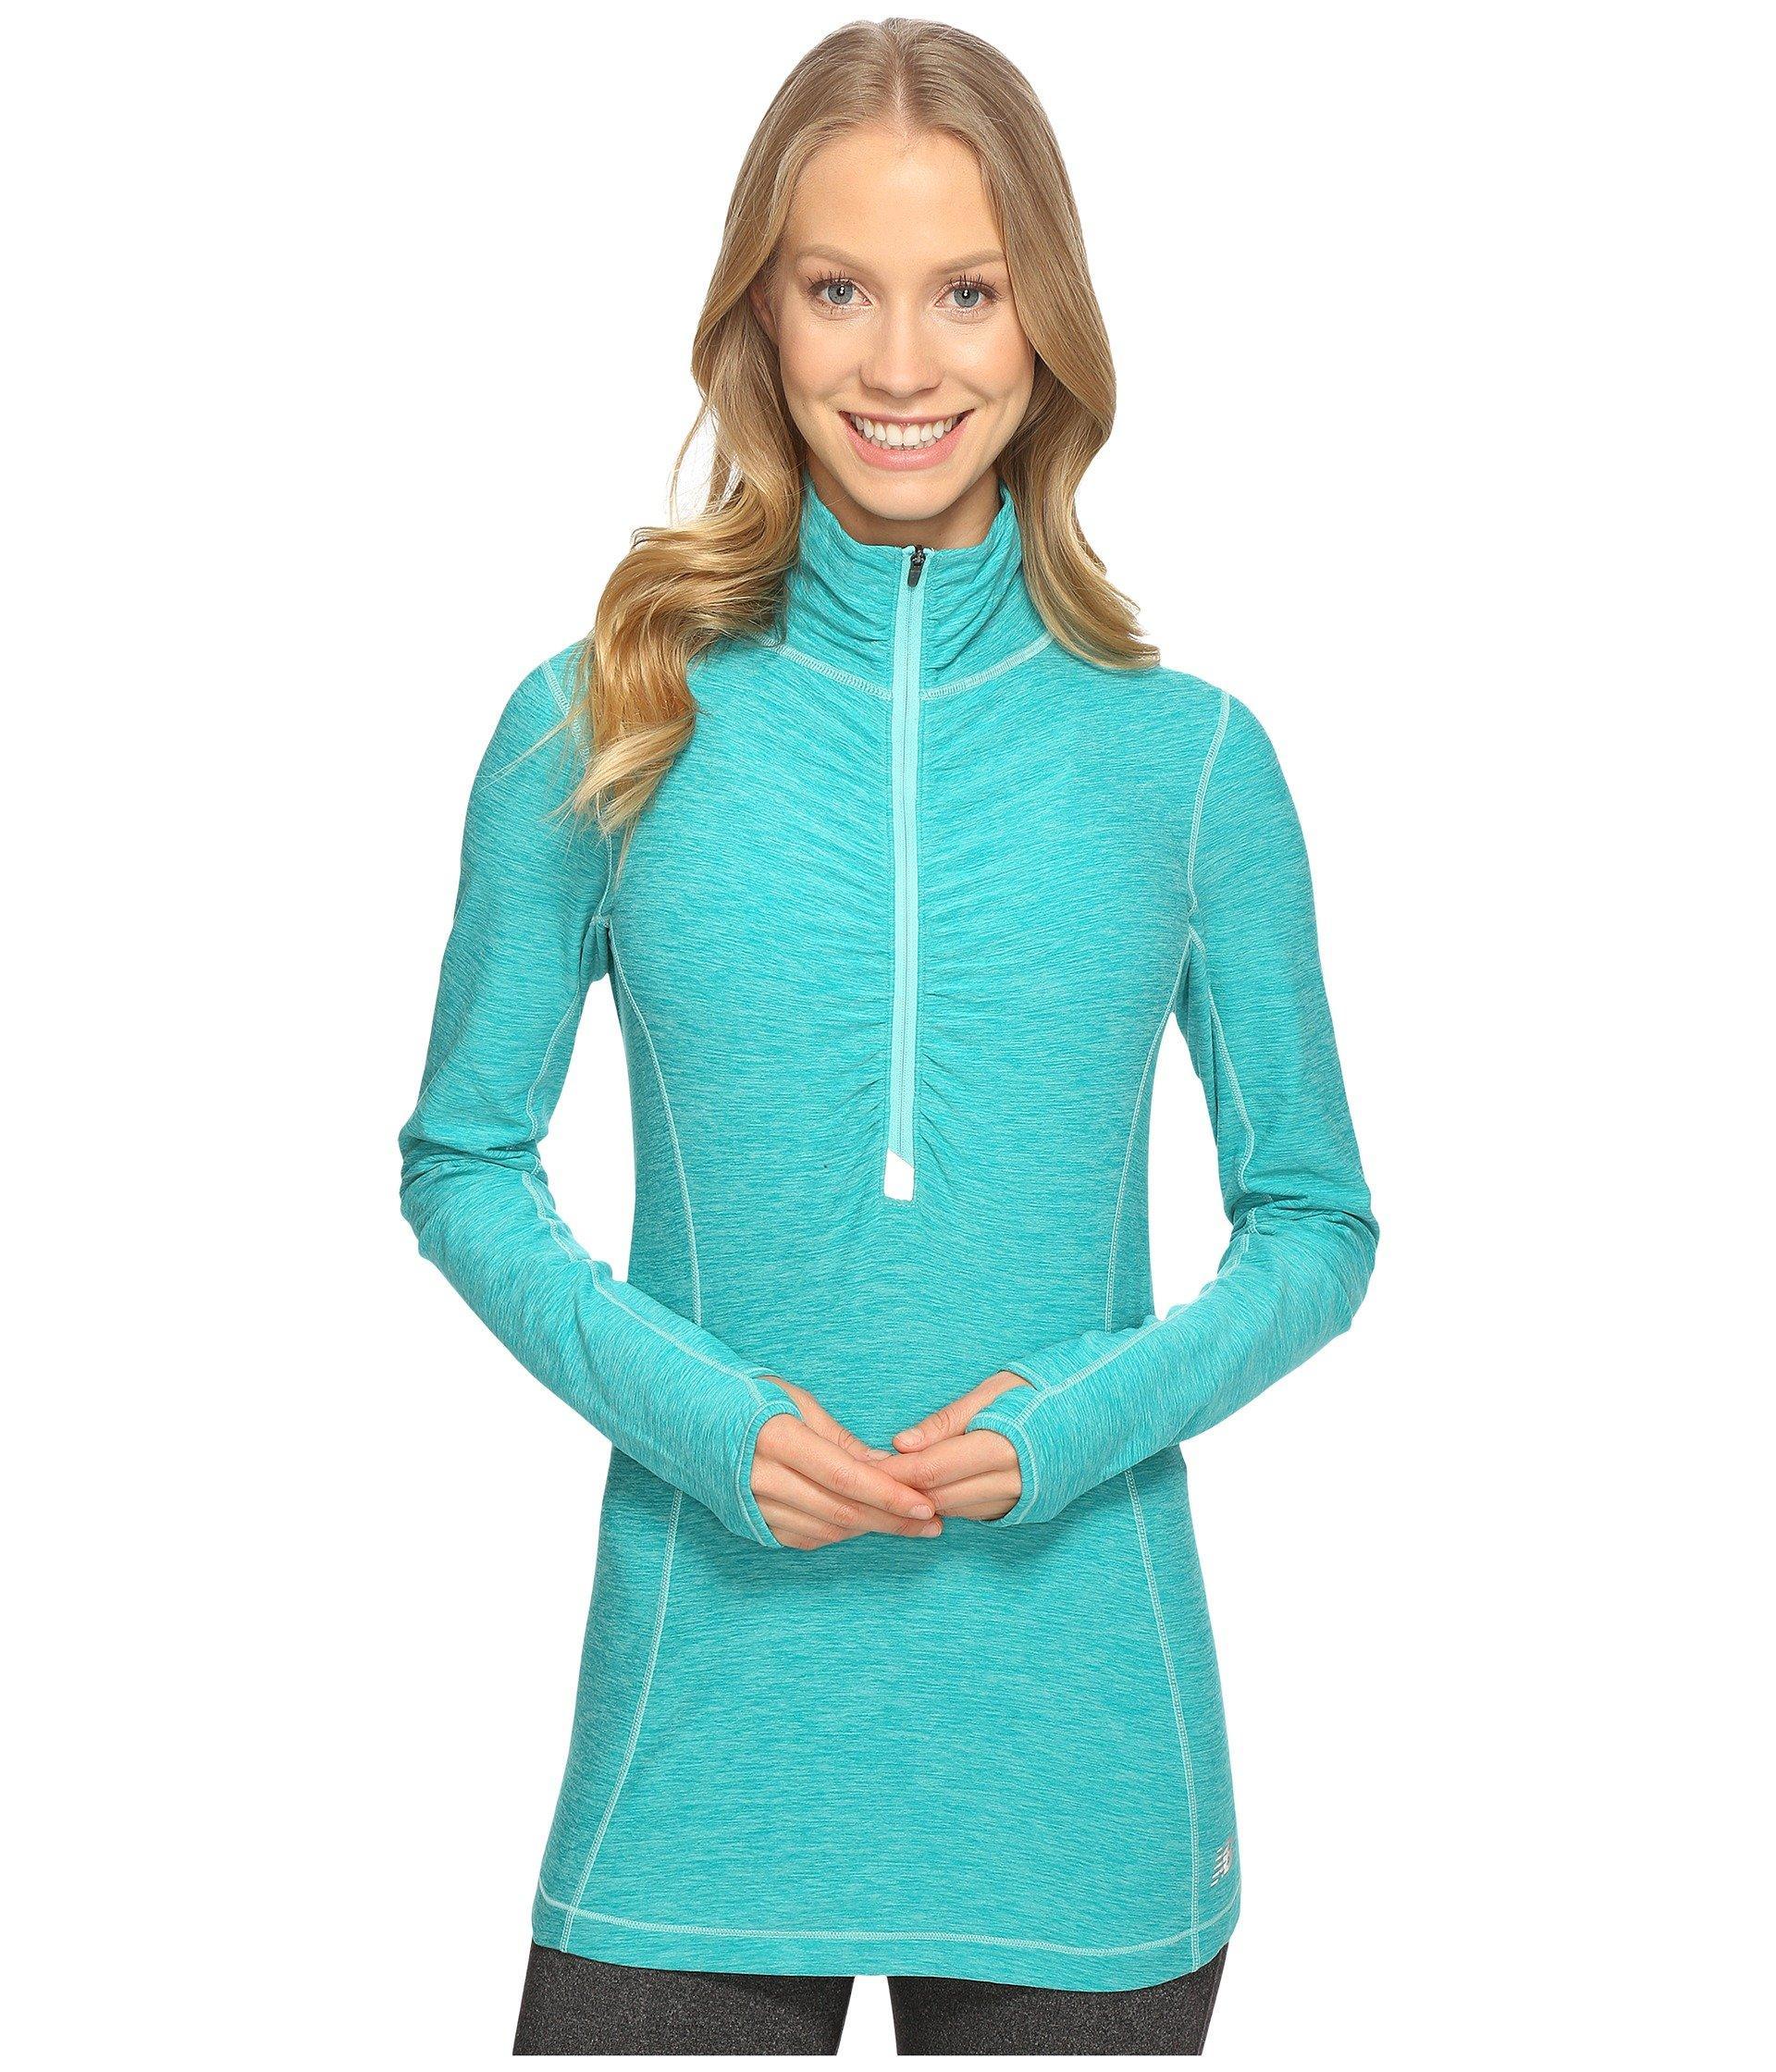 New Balance In Transit Half Zip Jacket In Aquarius Heather